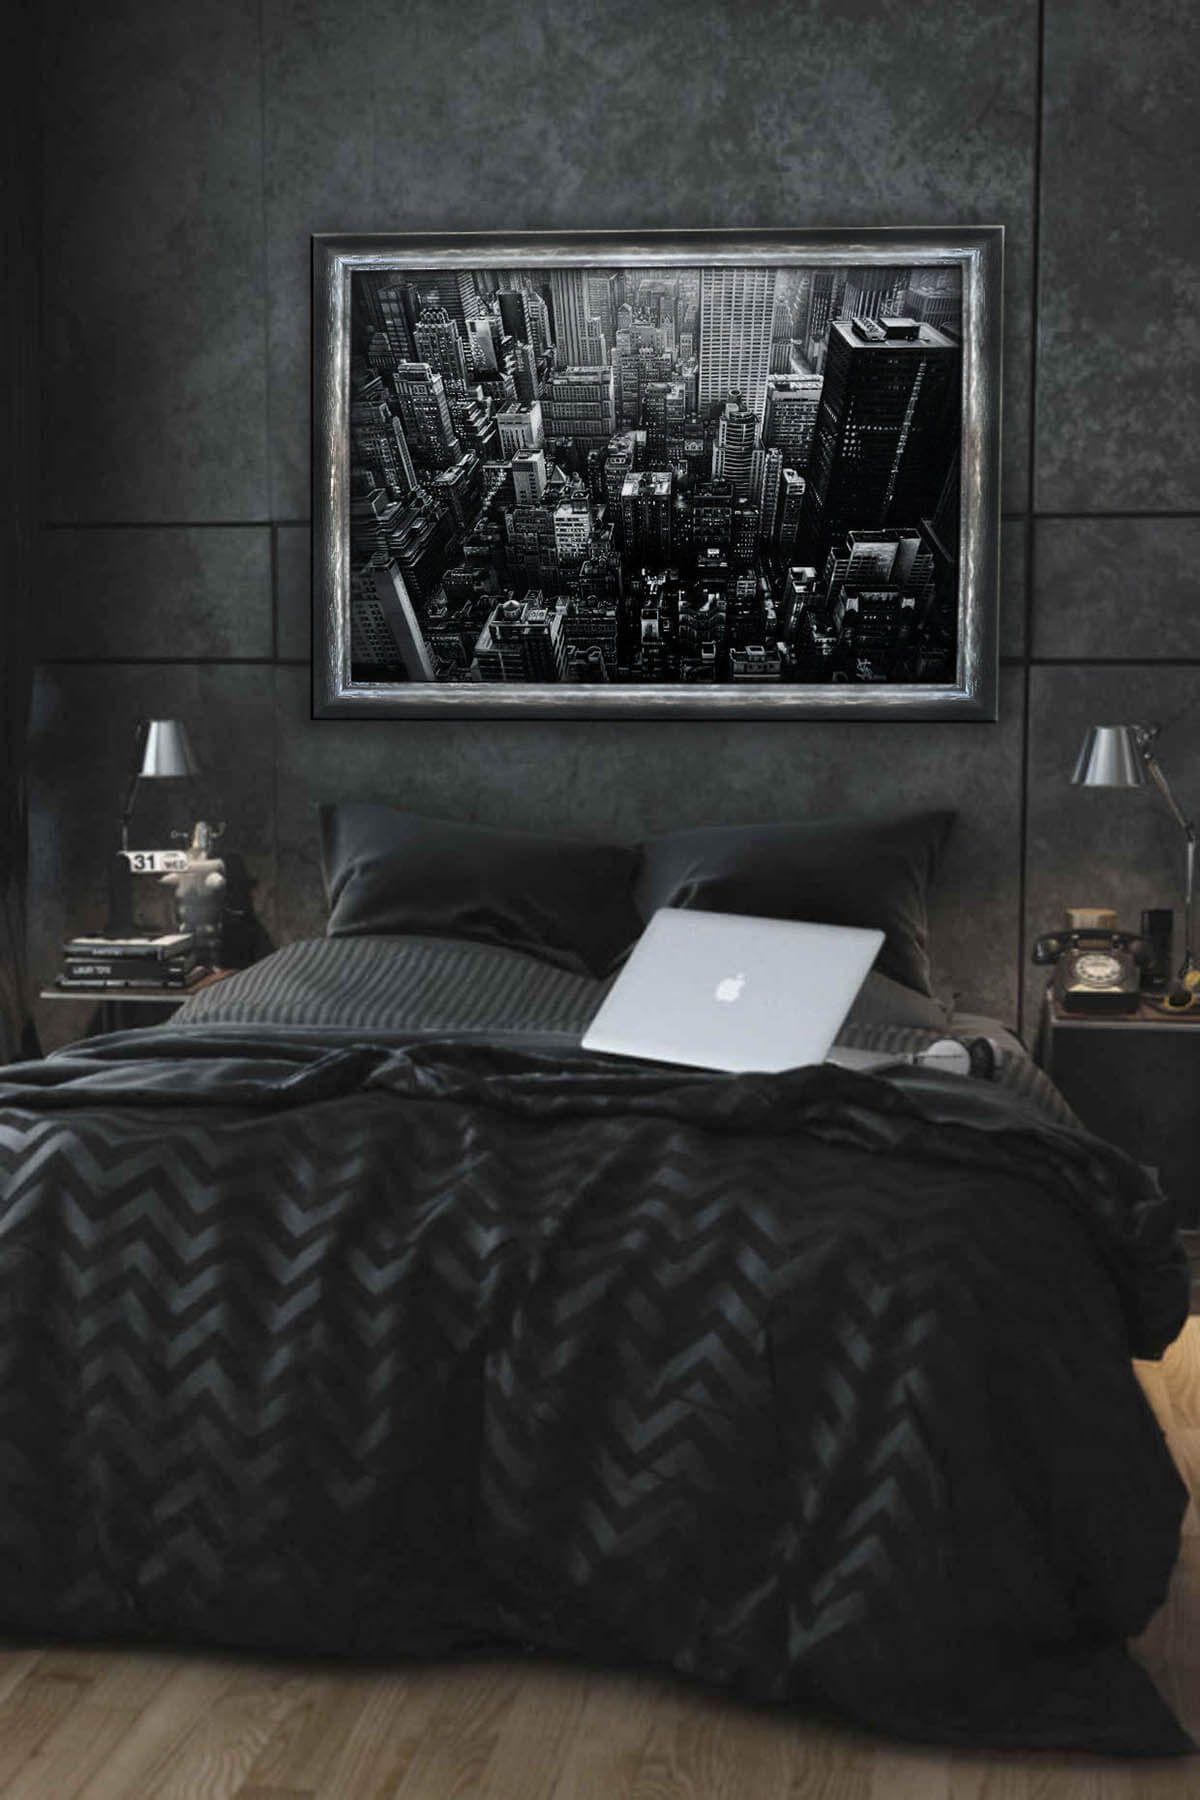 22 Beautiful Black Bedroom Design Ideas You Will Fall In Love With In 2020 Black Bedroom Decor Black Bedroom Furniture Decor Black Bedroom Design Bedroom design ideas black